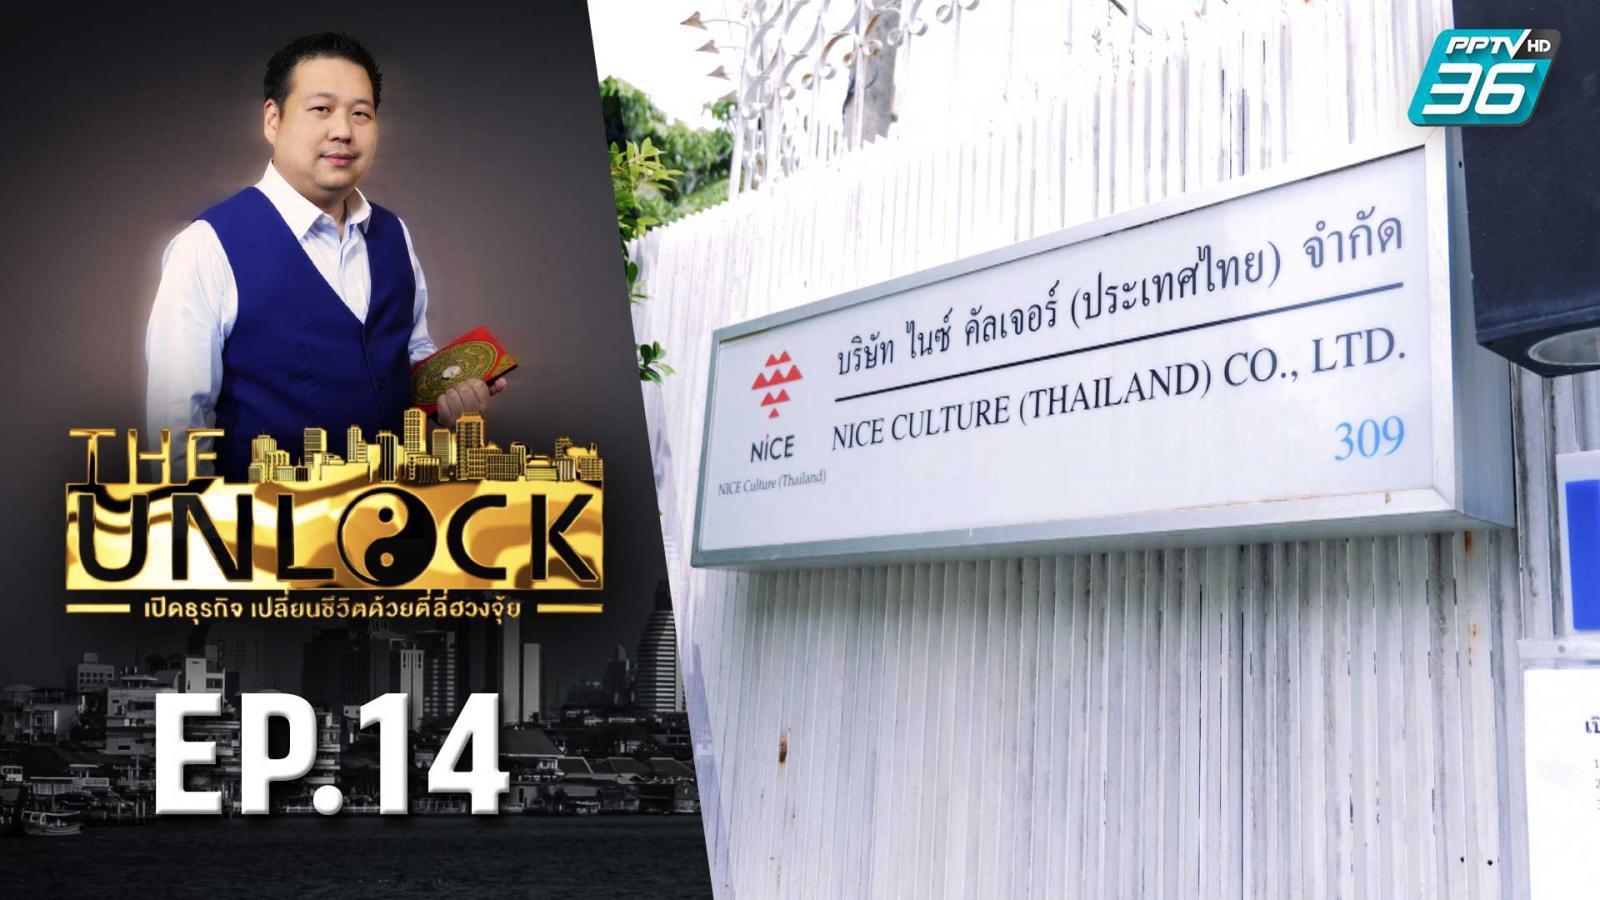 The Unlock เปิดธุรกิจ เปลี่ยนชีวิตด้วยตี่ลี่ฮวงจุ้ย | ตอน เอเจนซี่โฆษณา EP.14 | PPTVHD 36